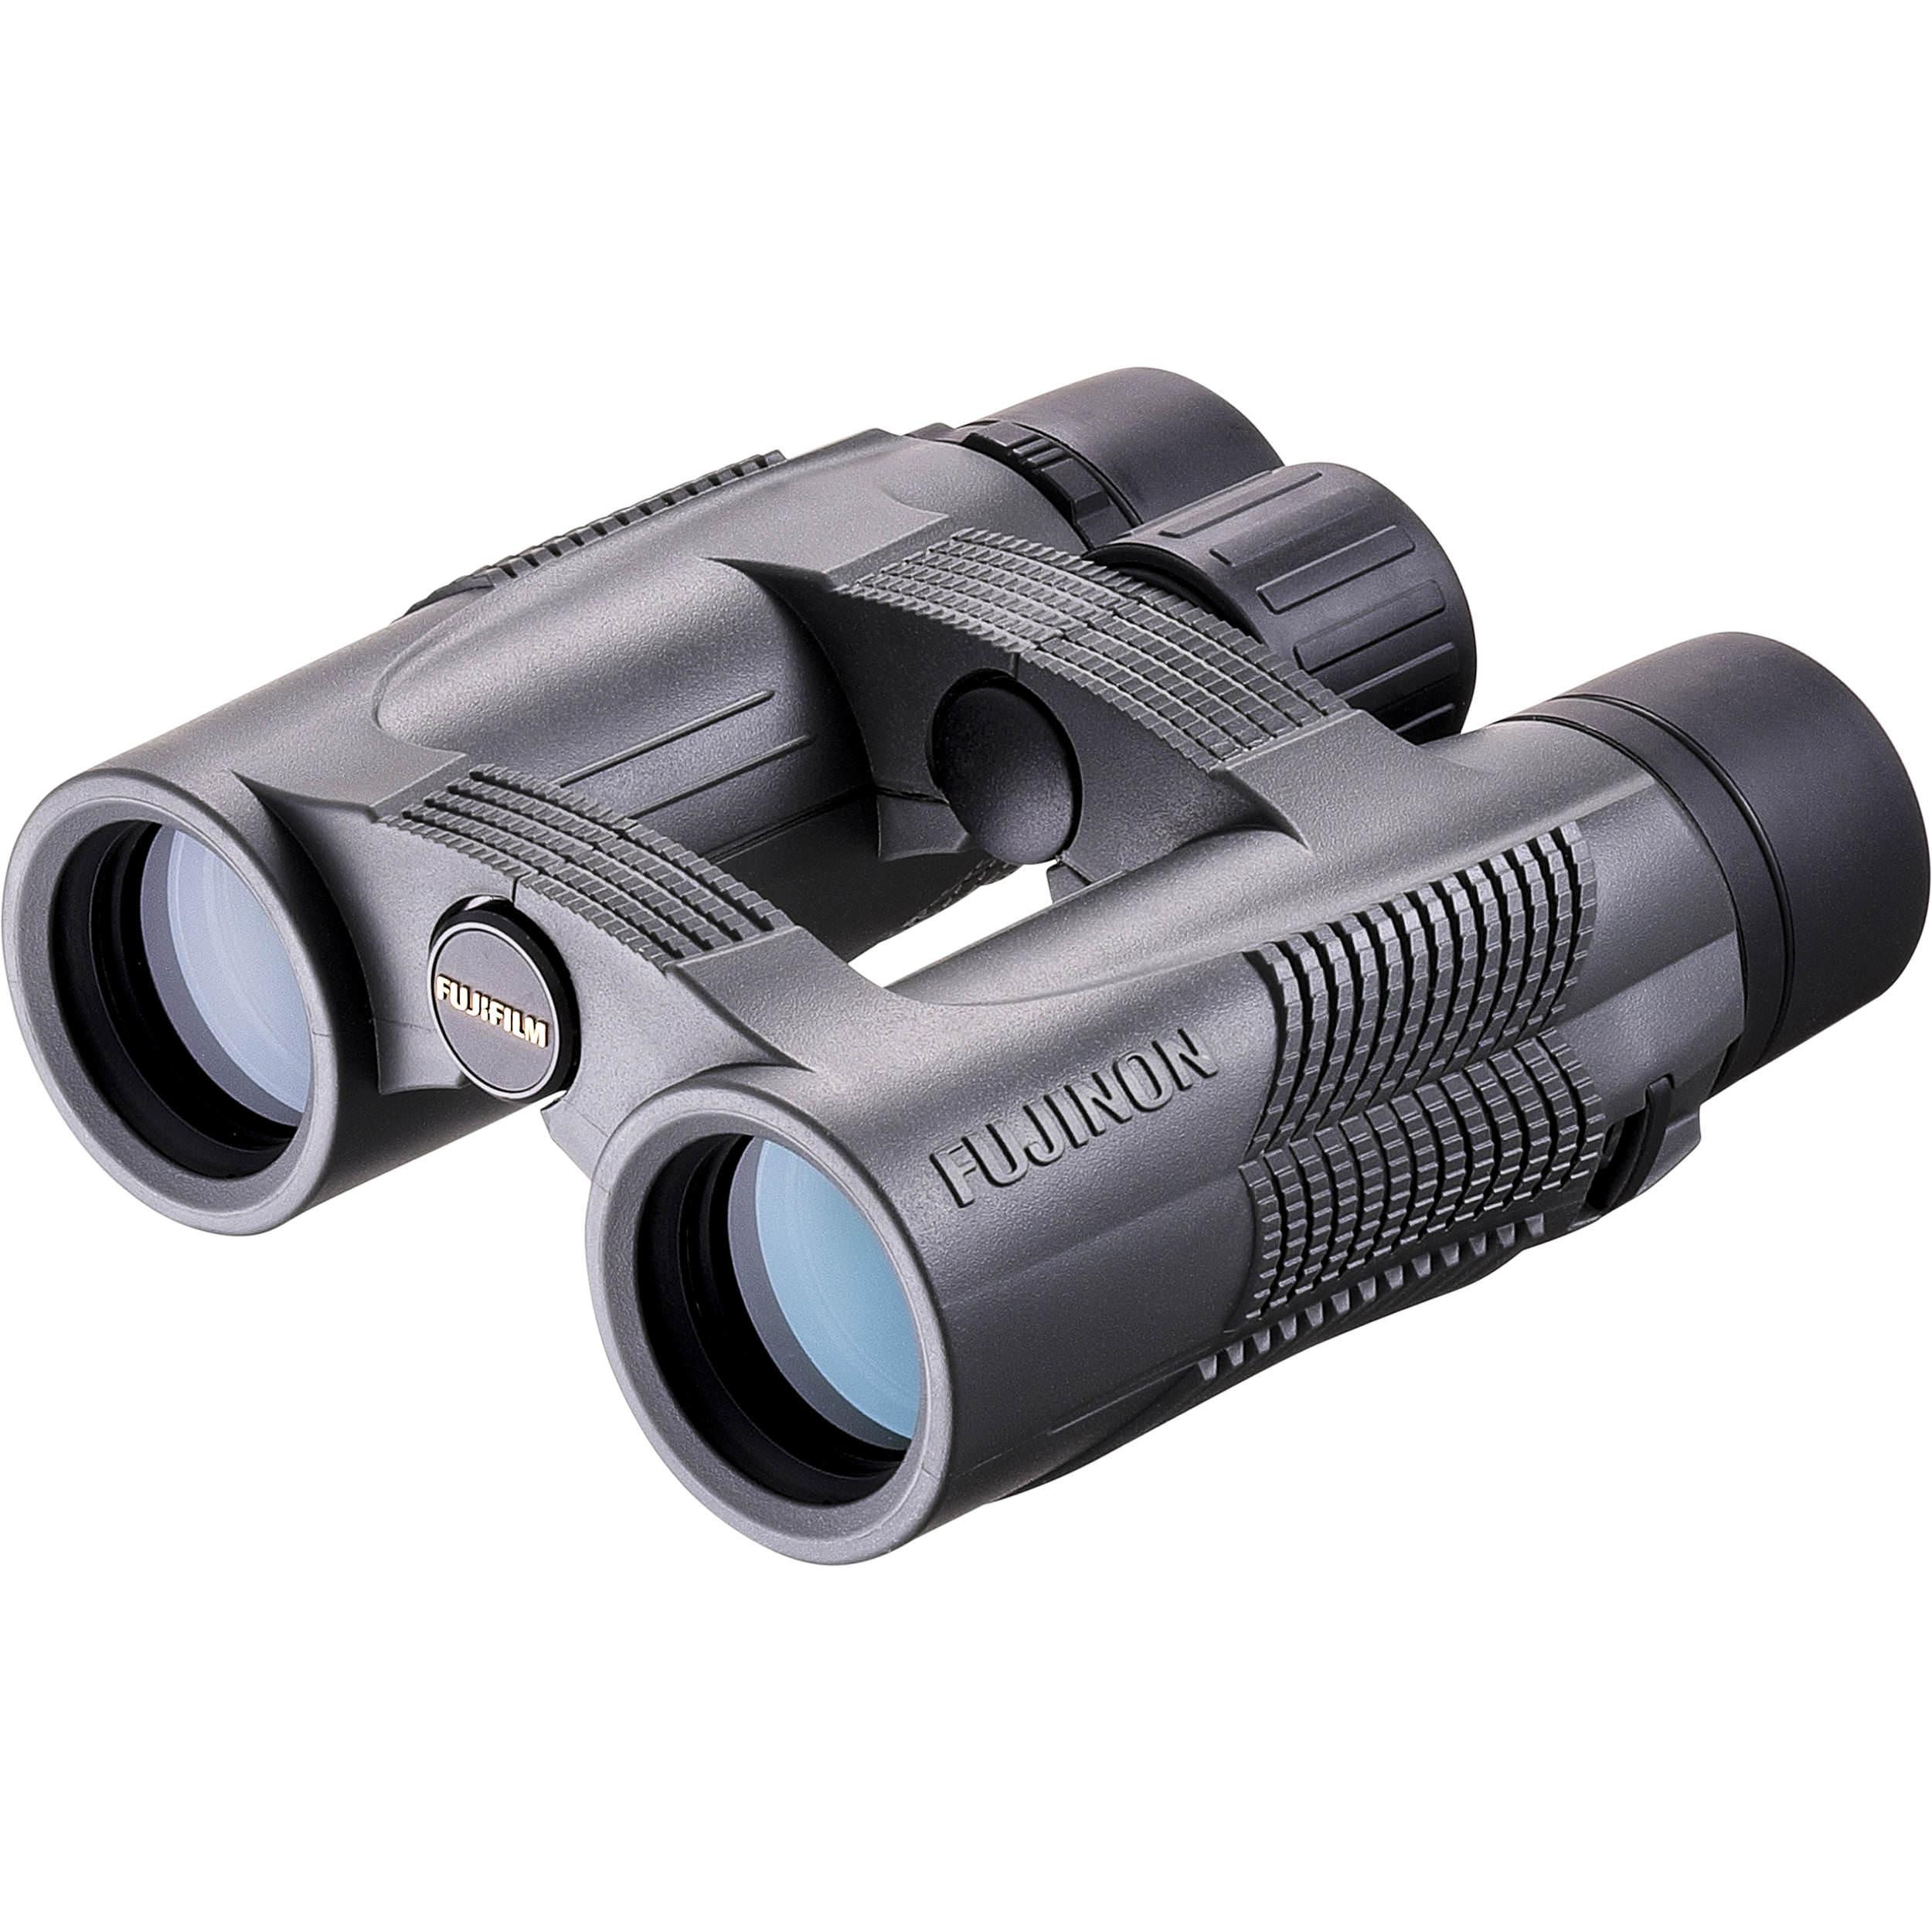 Fujifilm KF 10x32 W Binocular